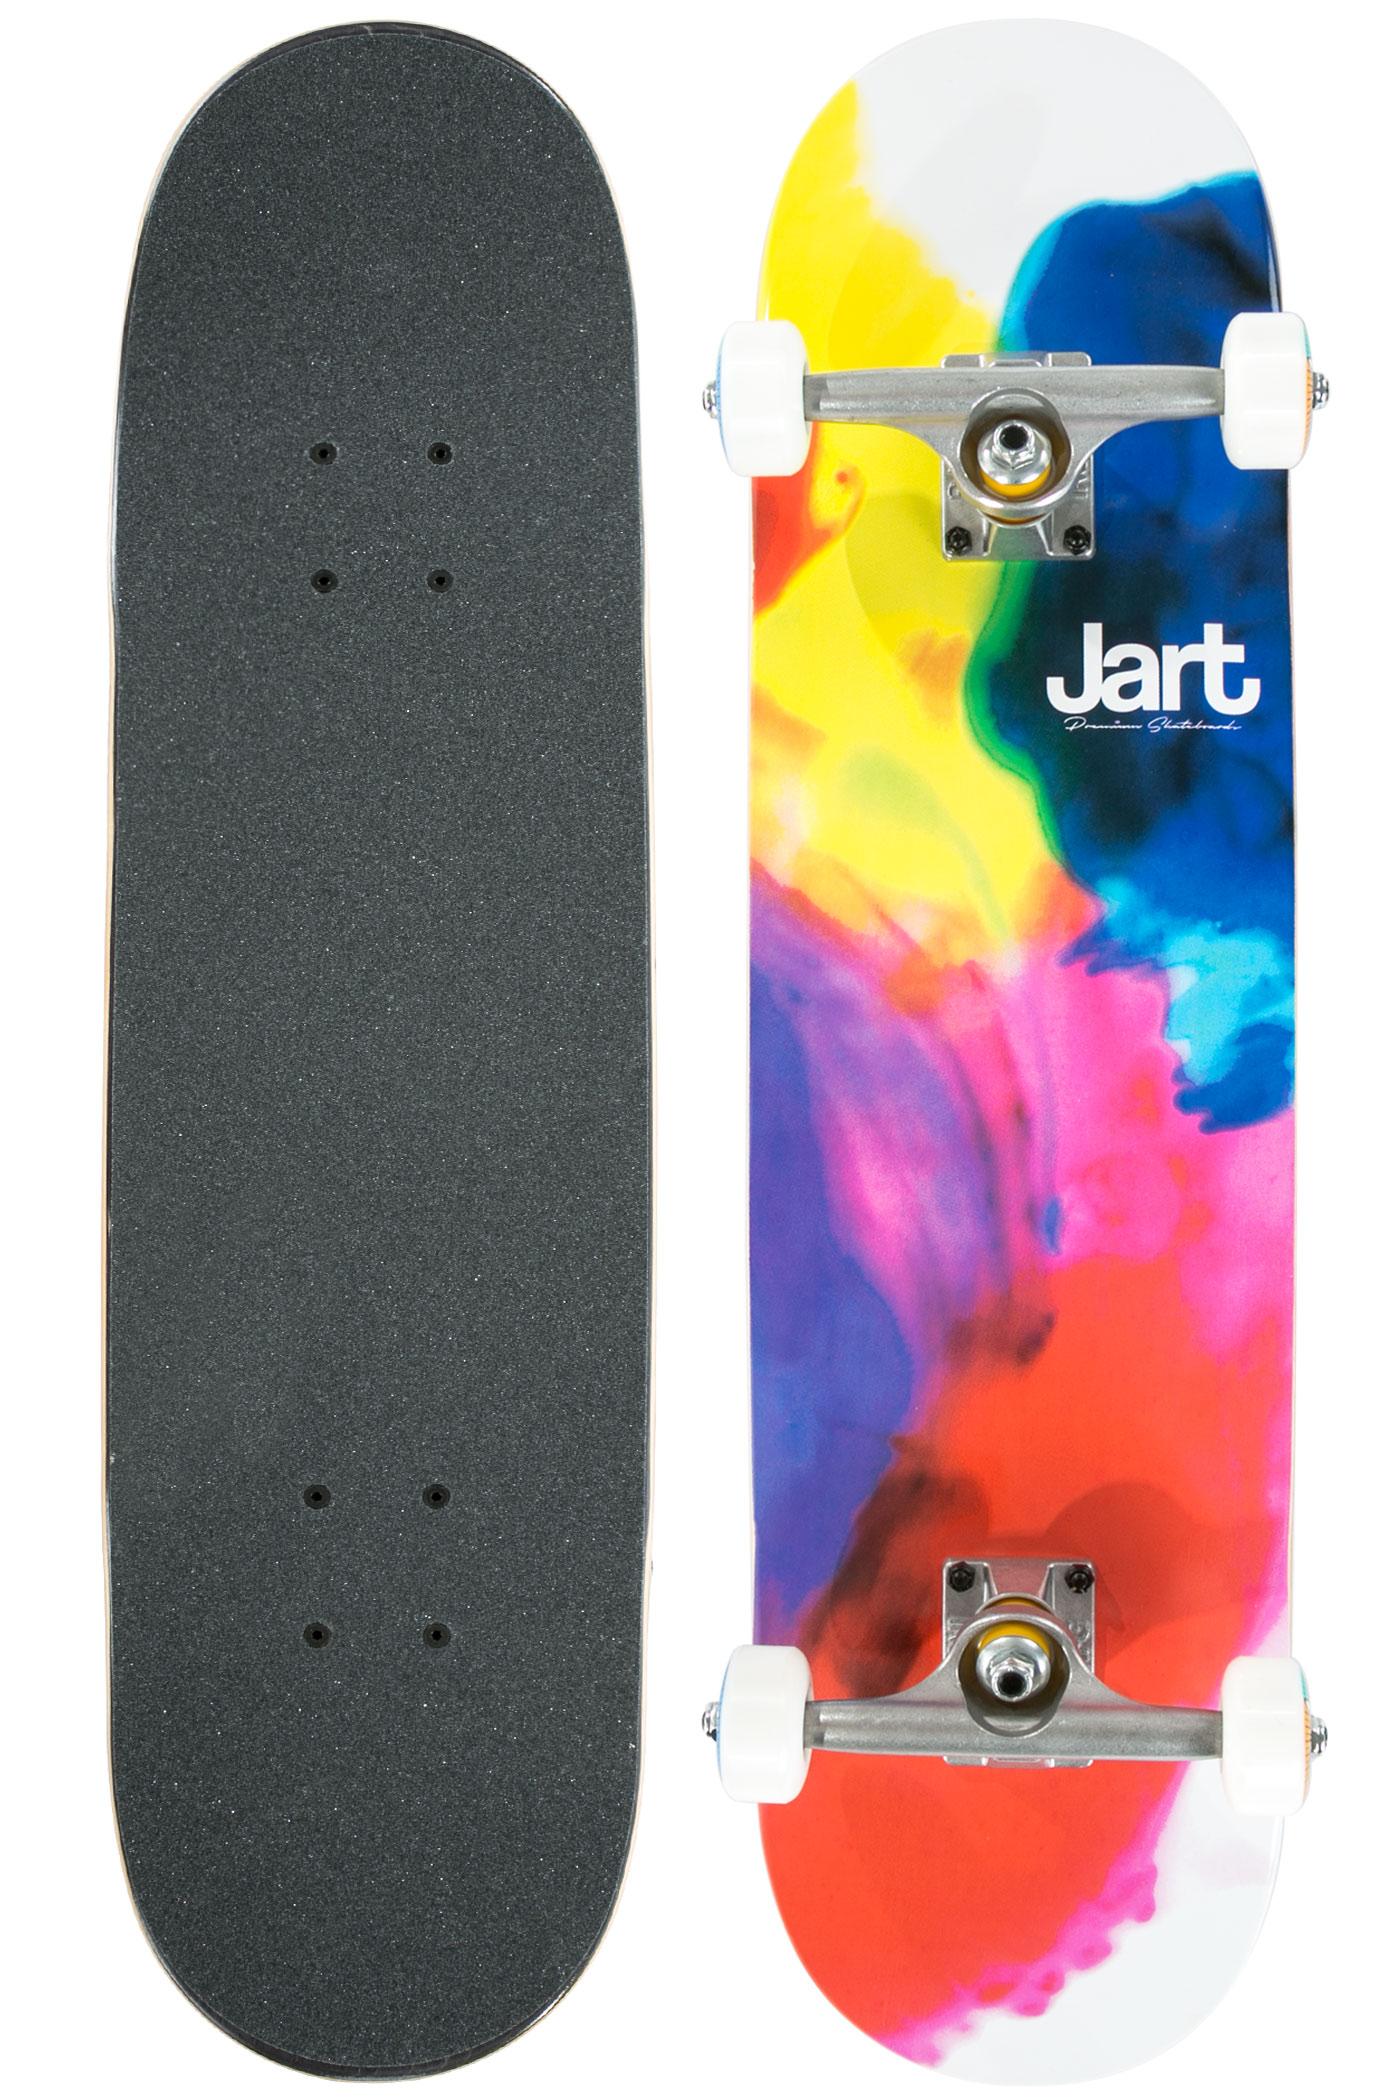 Jart skateboards paint complete board multi buy at for Best paint for skateboard decks